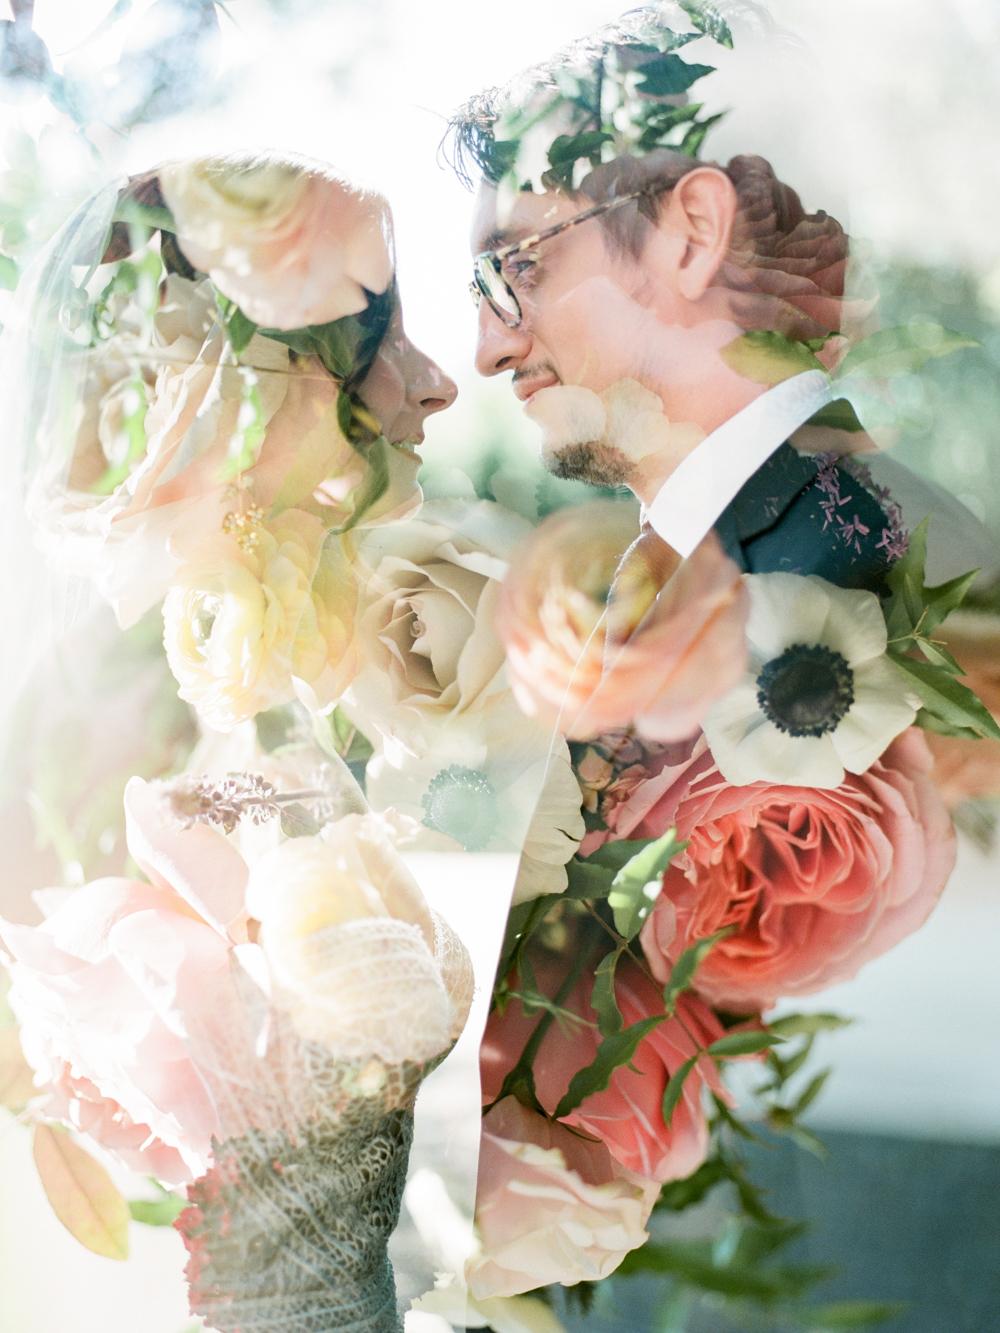 fall wedding at rothko chapel- houston wedding photographer-christine gosch - film photographer - elopement photographer- intimate wedding - lovely bride wedding gown-3.jpg